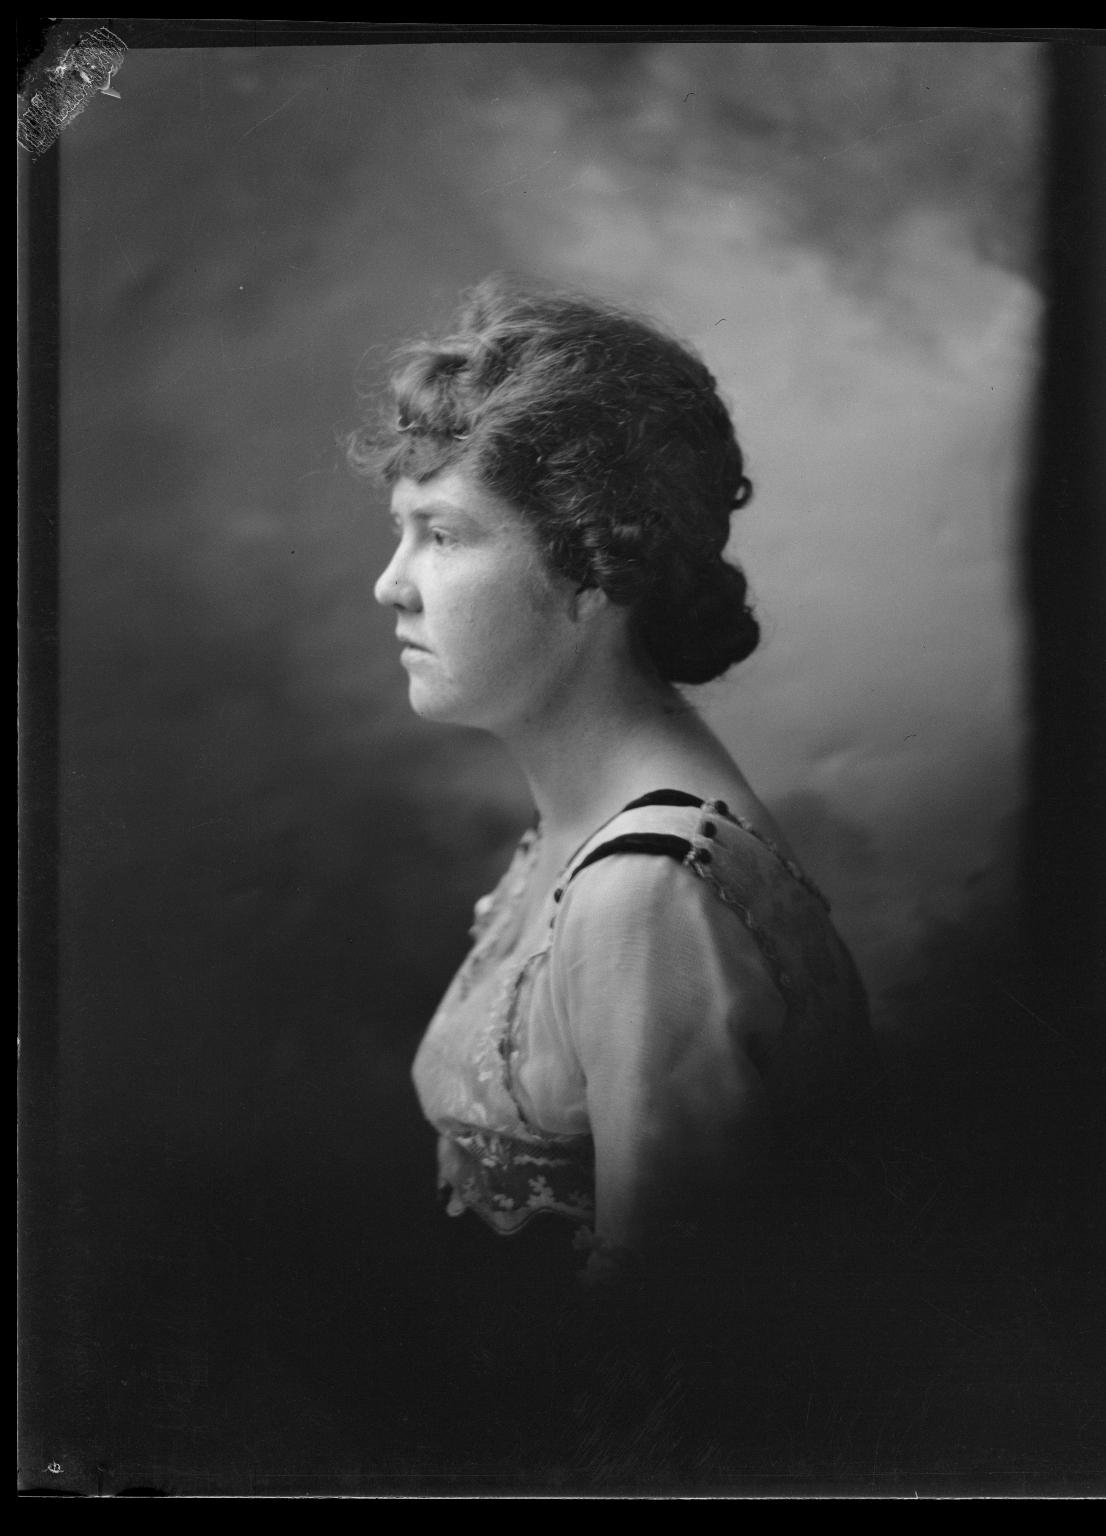 Portraits of Elizabeth Hummel